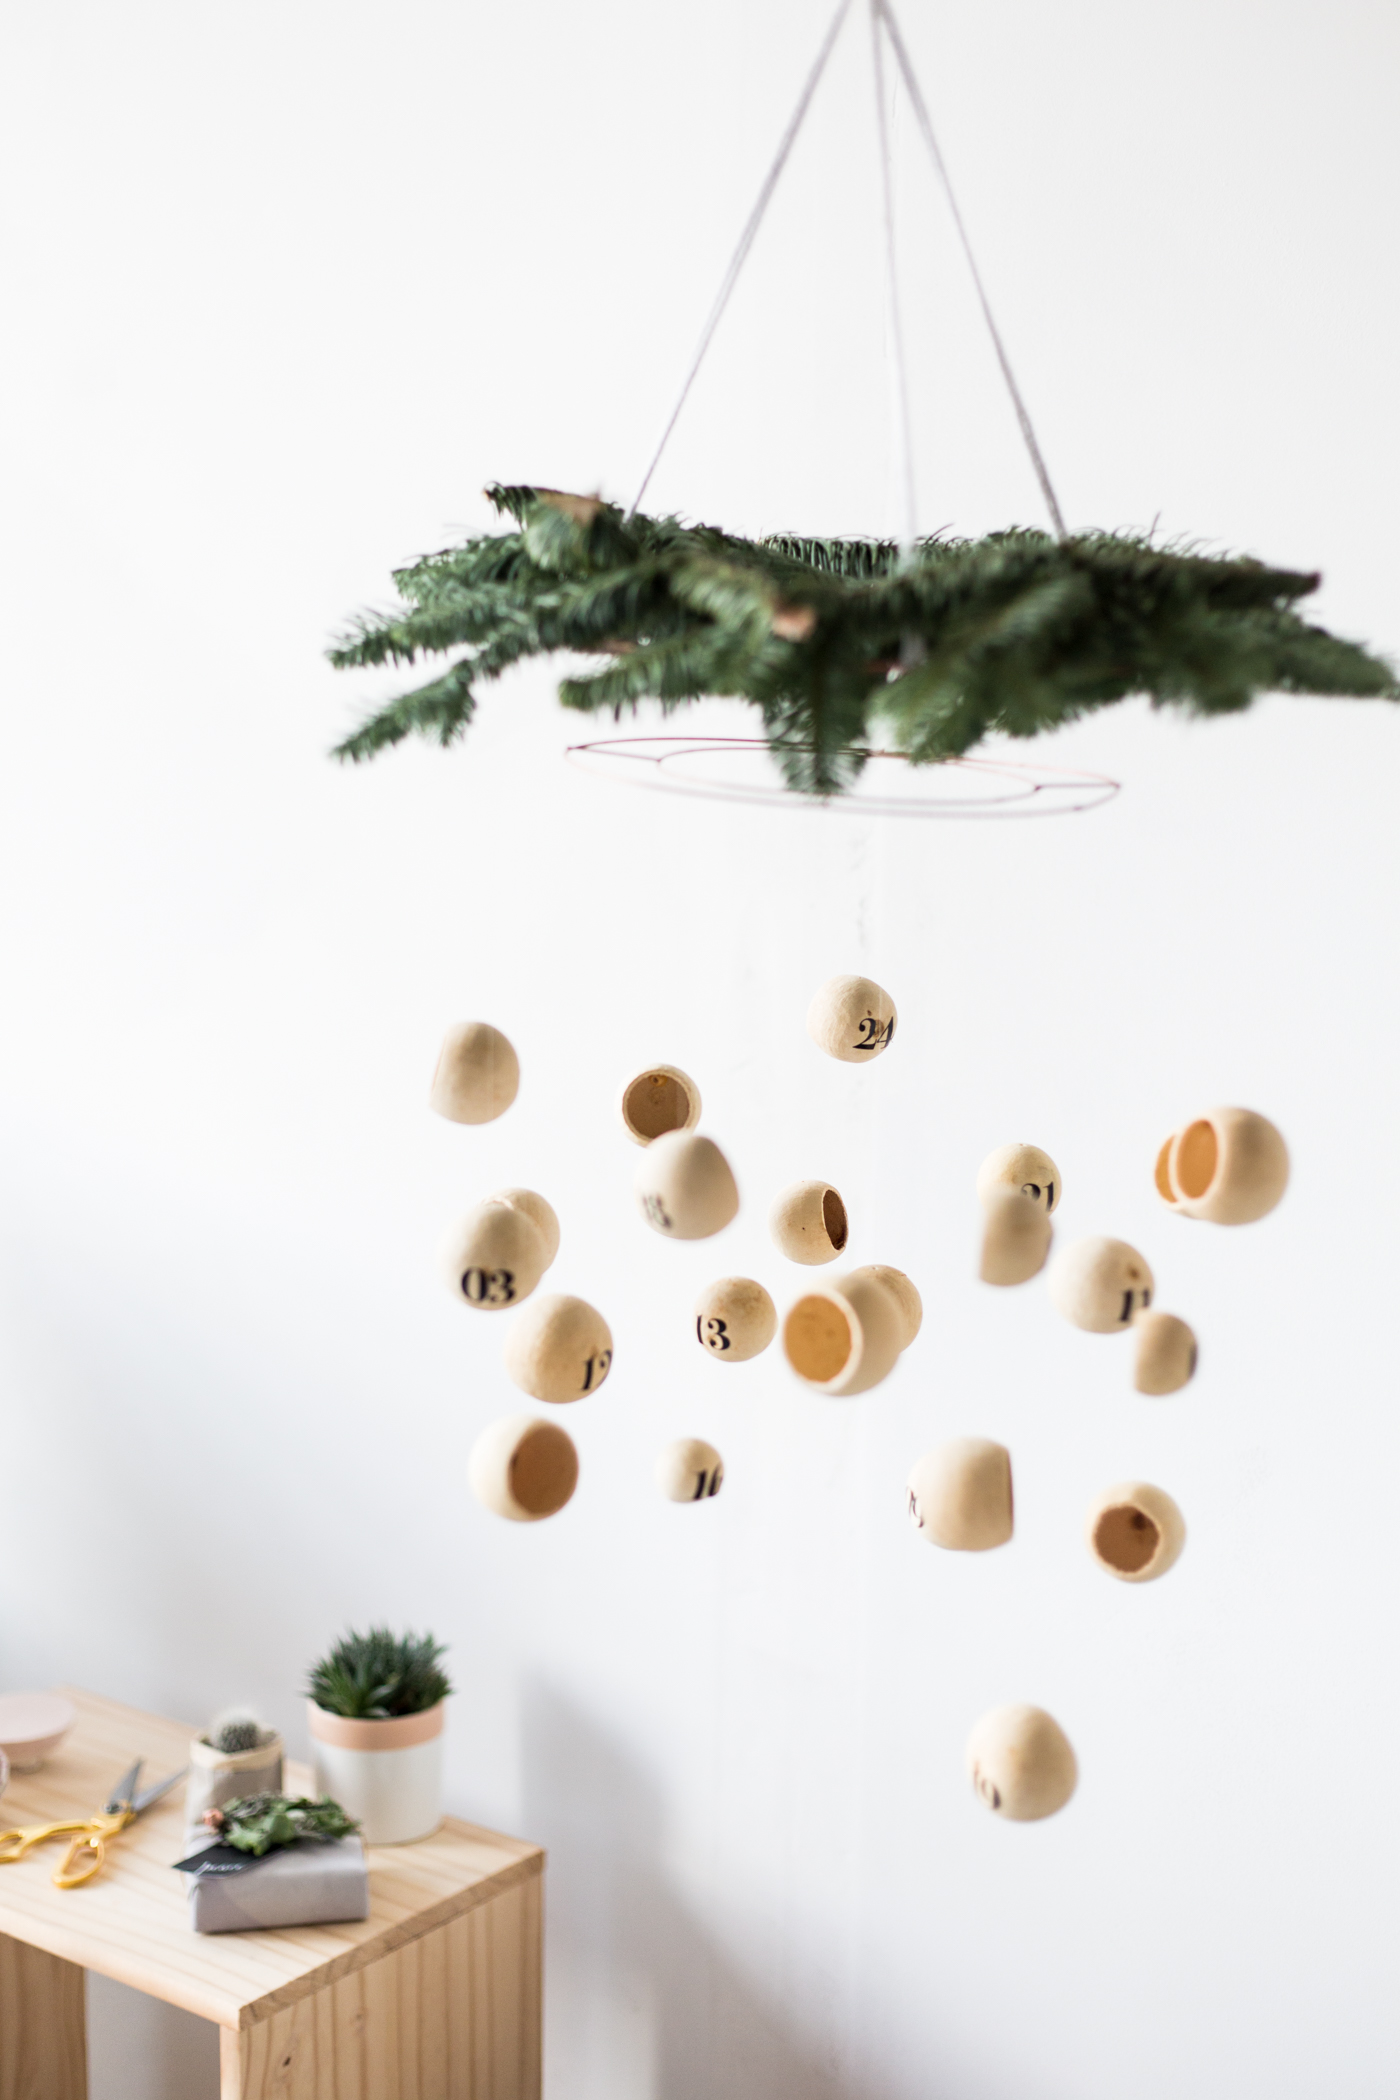 Make a DIY Floating Pod Advent Calendar Mobile | @fallfordiy